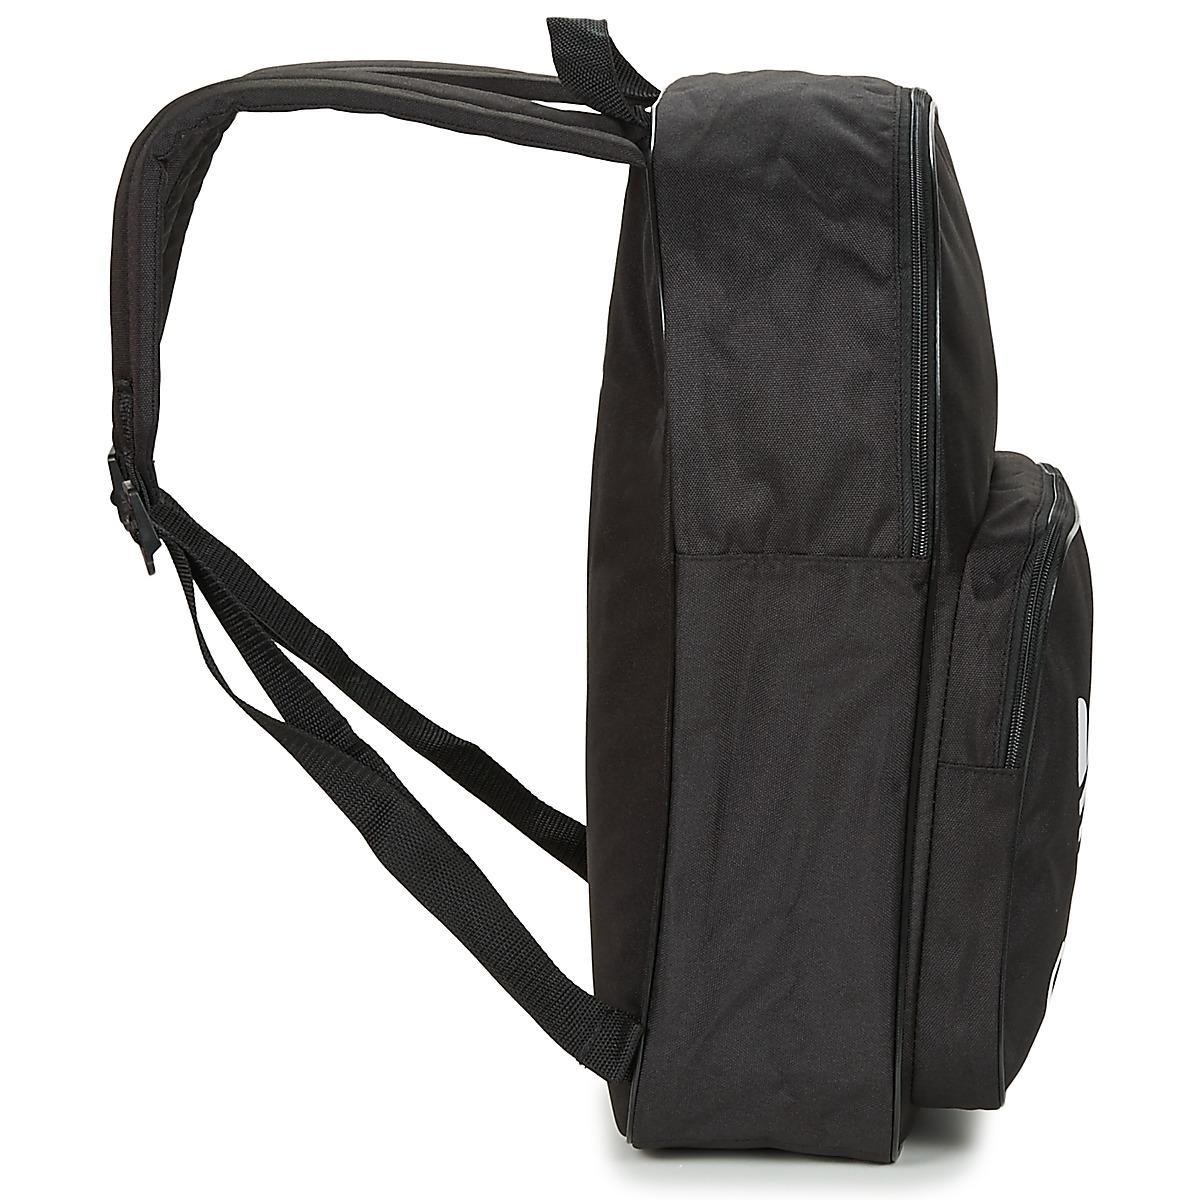 9bff38bed2a0 Adidas - Black Bp Clas Trefoil Backpack - Lyst. View fullscreen